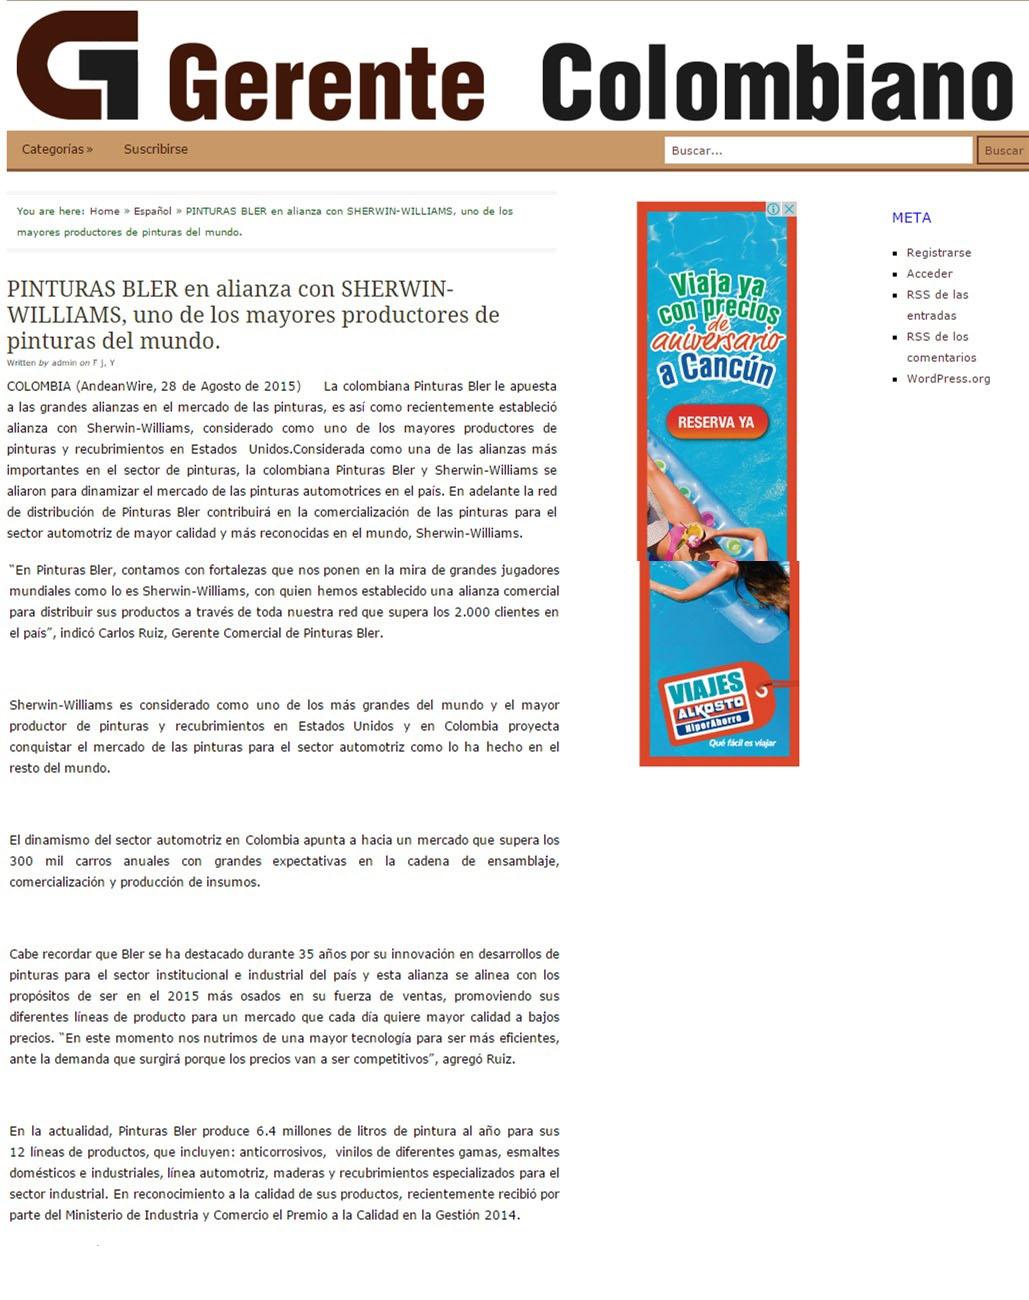 Gerente Colombiano 28 d agosto [web]